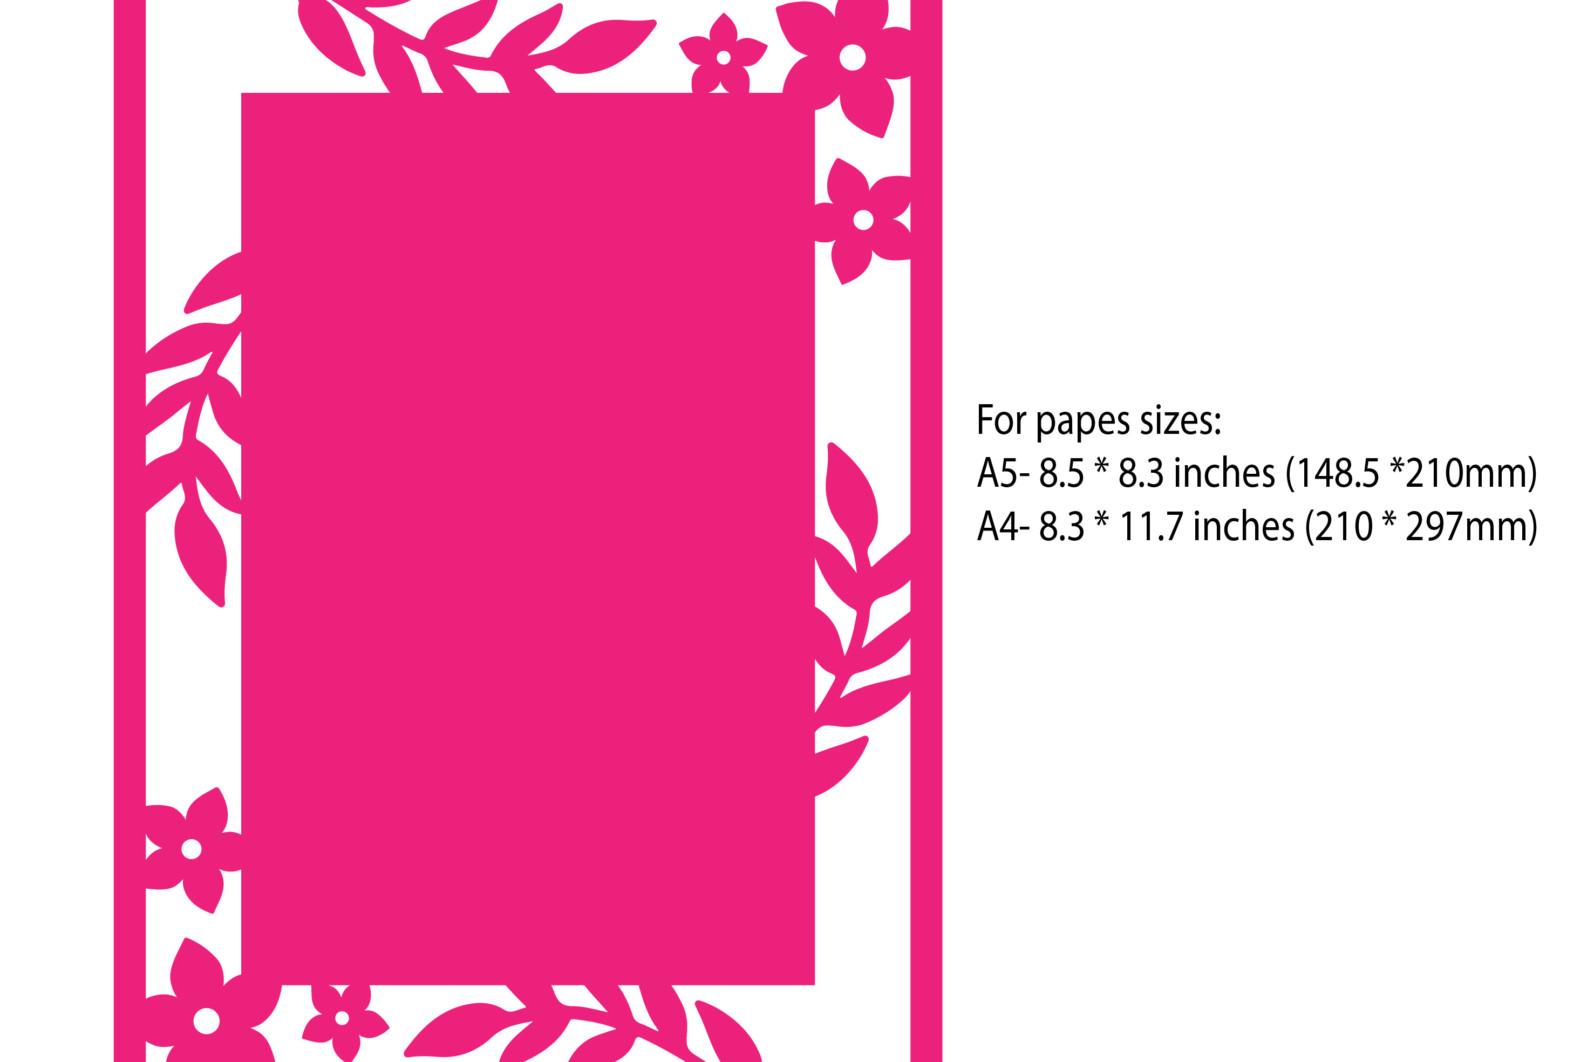 Floral border card - Floral border card 01 1 scaled -